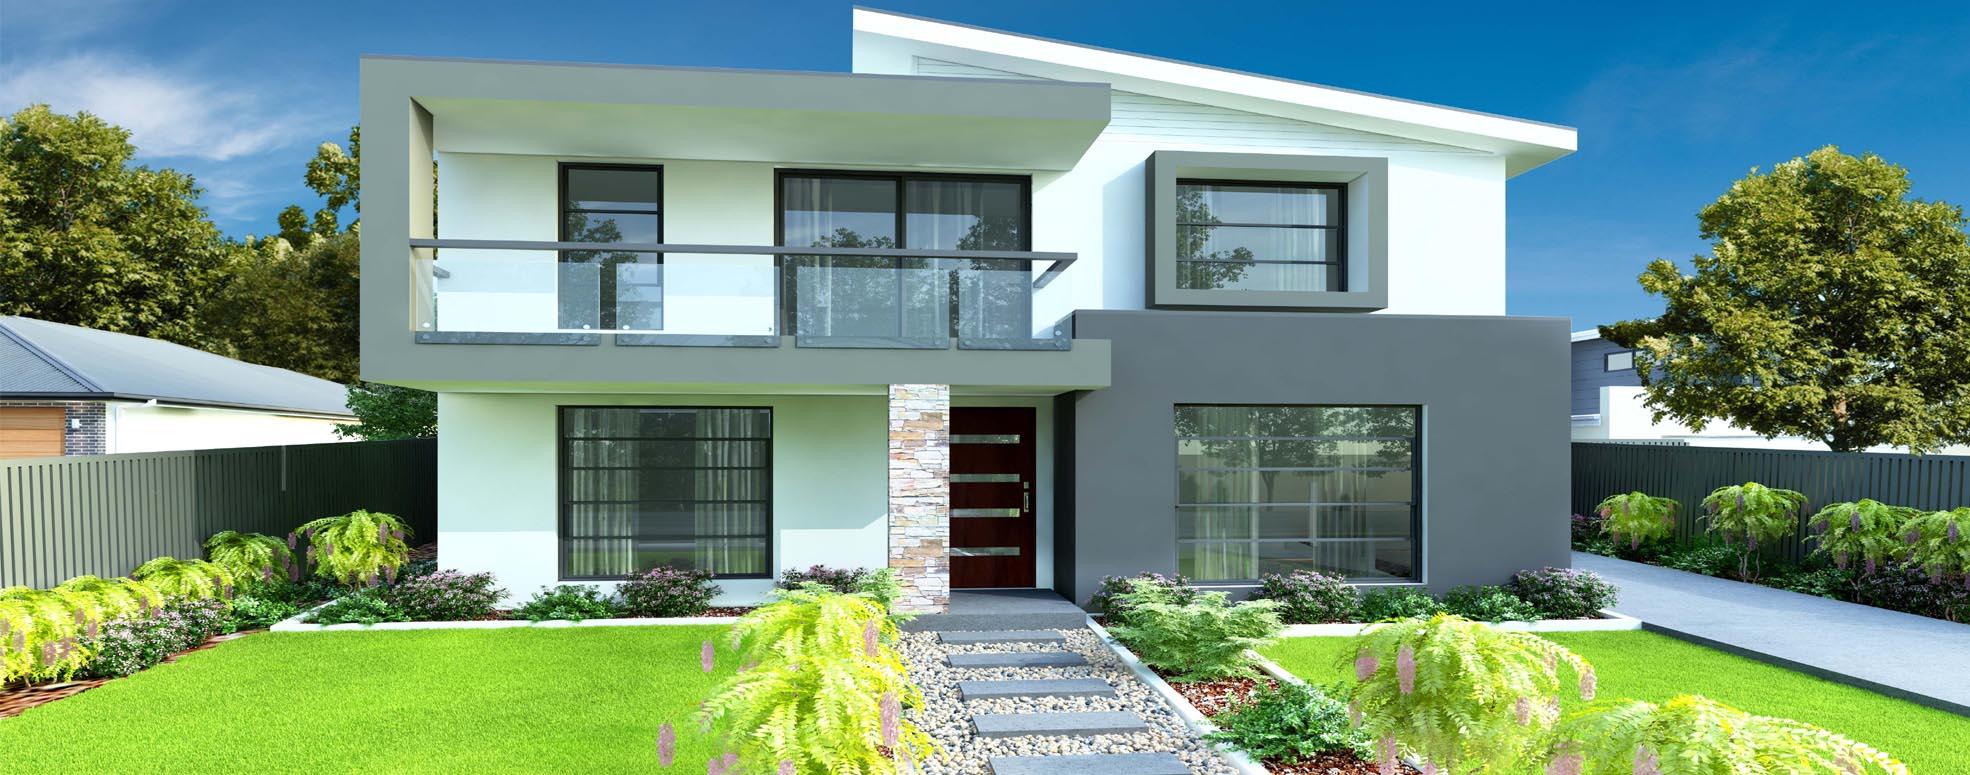 Modern Architecture Services